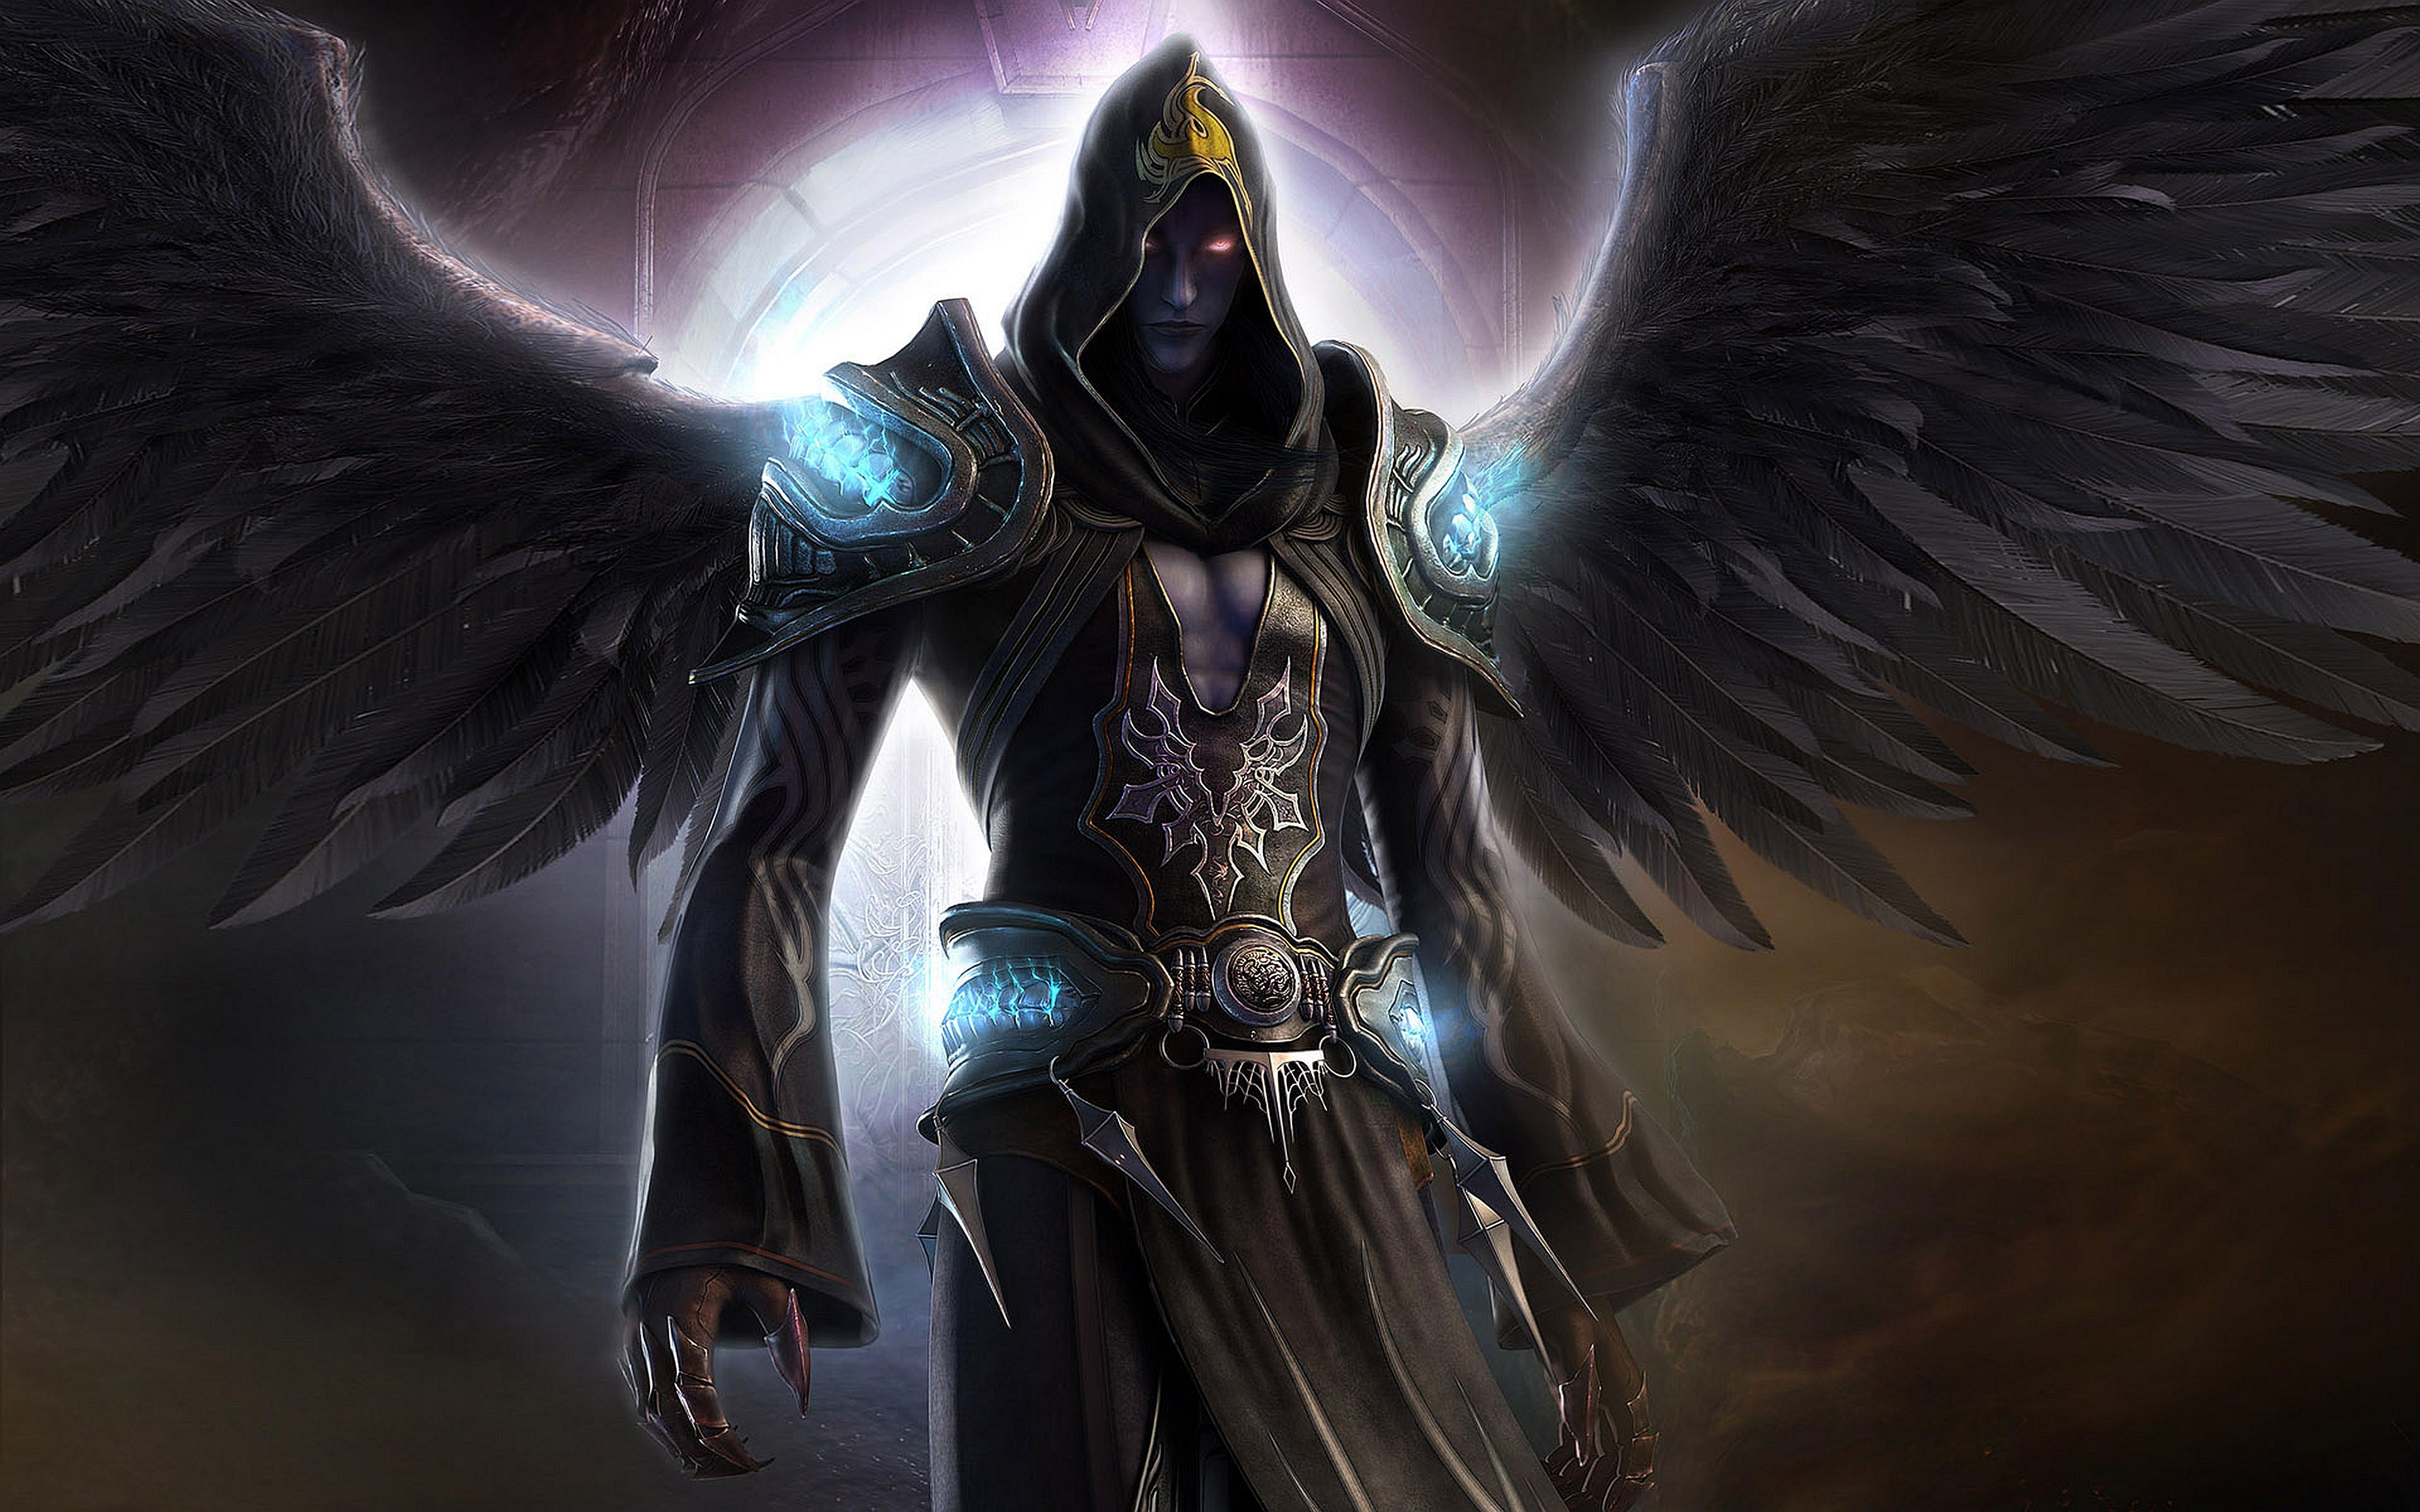 Angel Warrior Art - ID: 52728